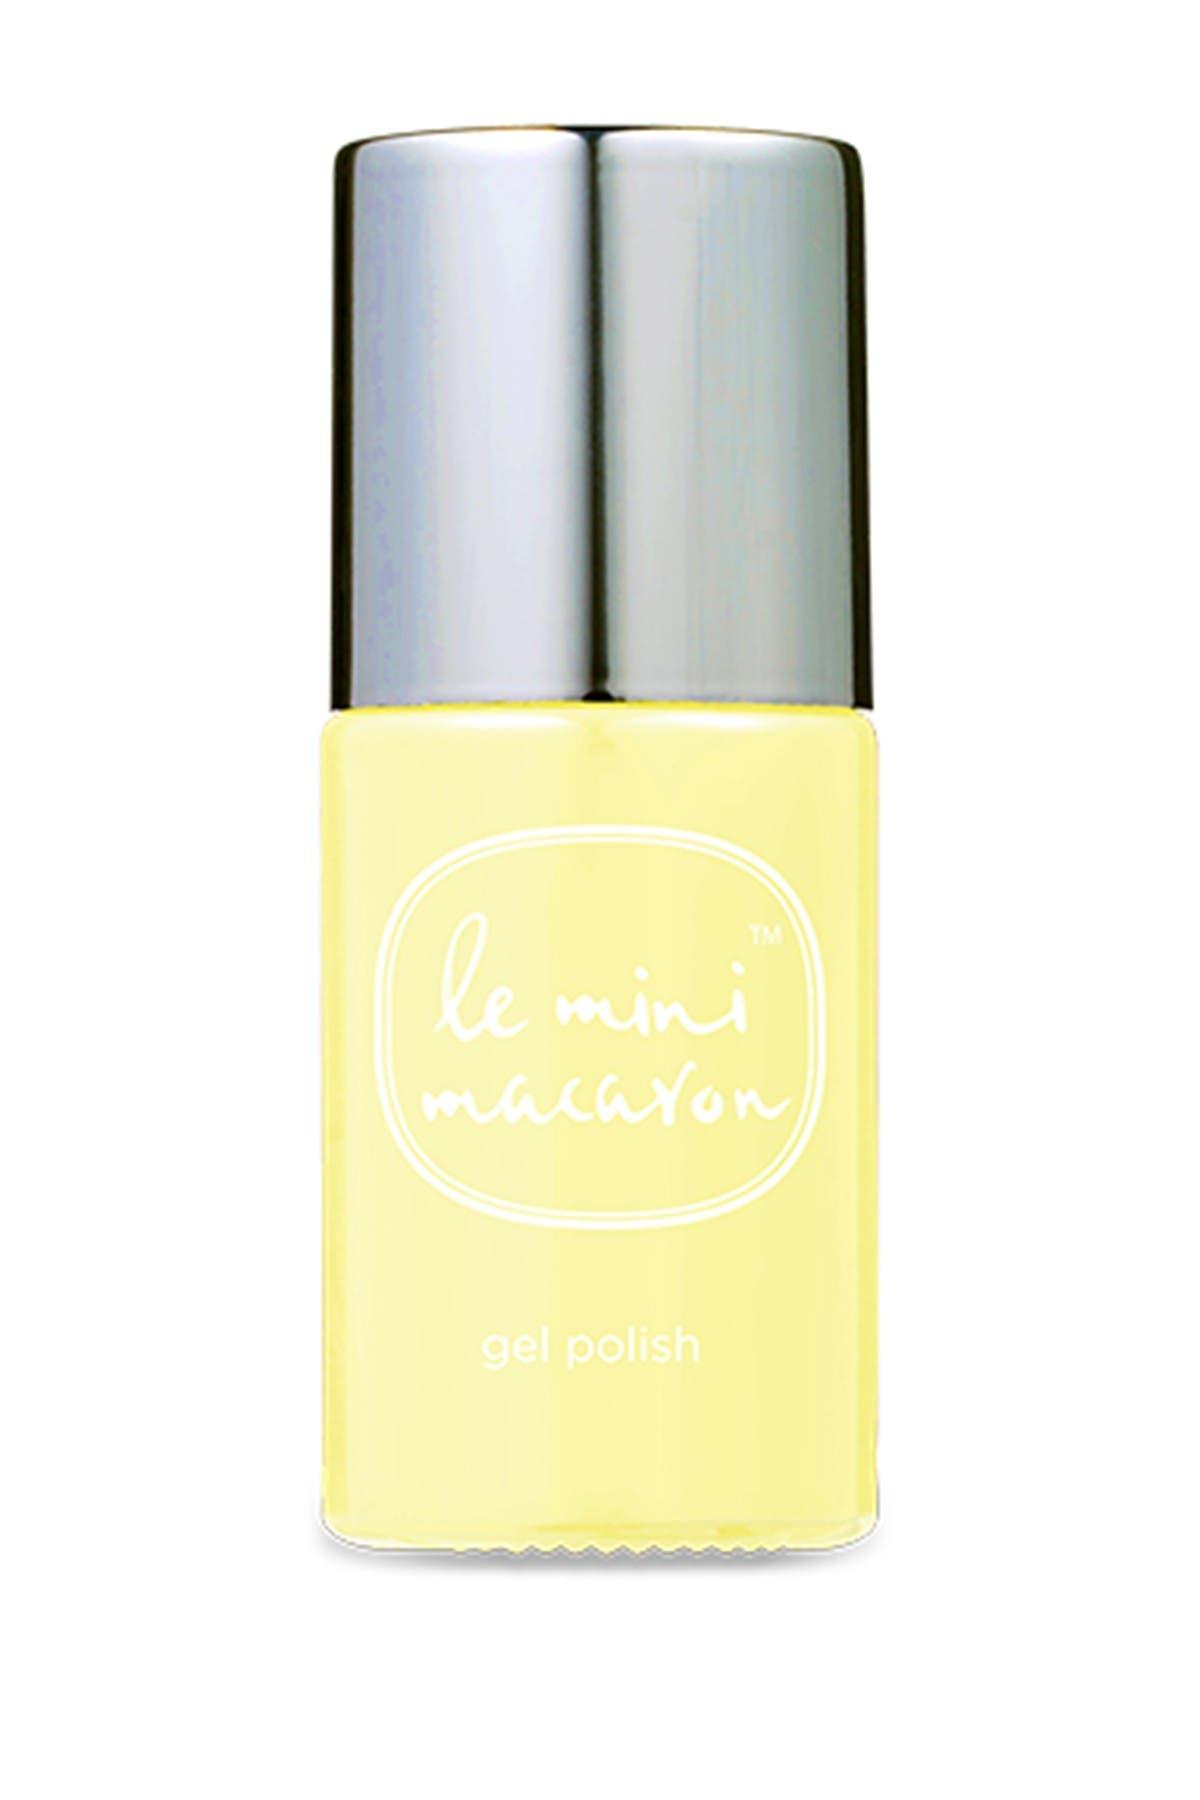 Image of LE MINI MACARON Gel Nail Polish - Lemon Sorbet